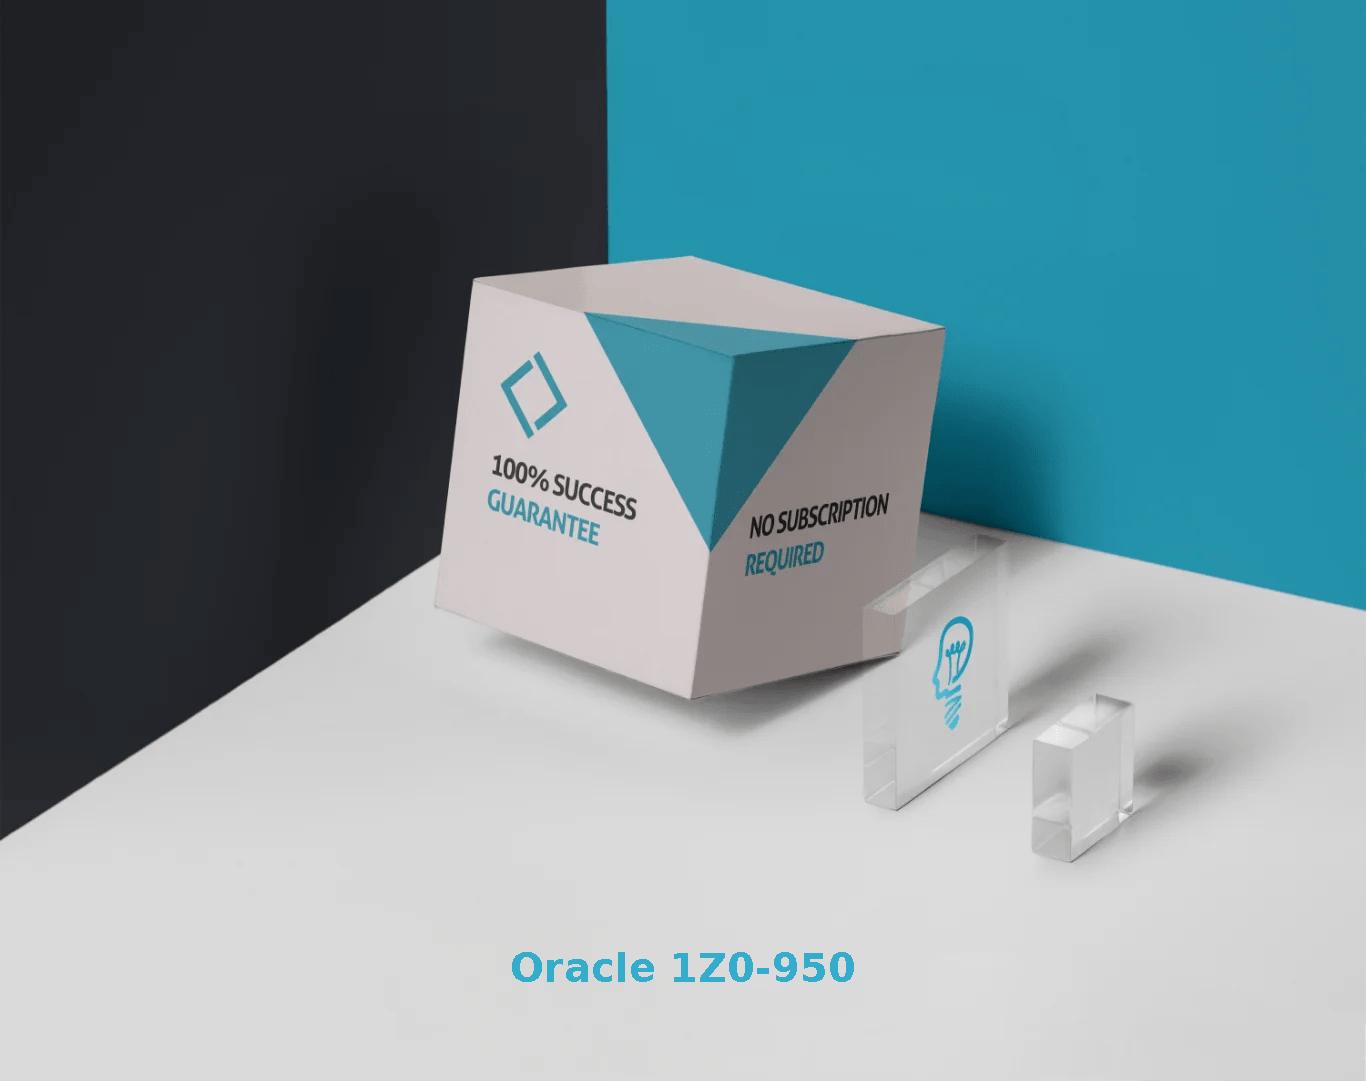 Oracle 1Z0-950 Exams